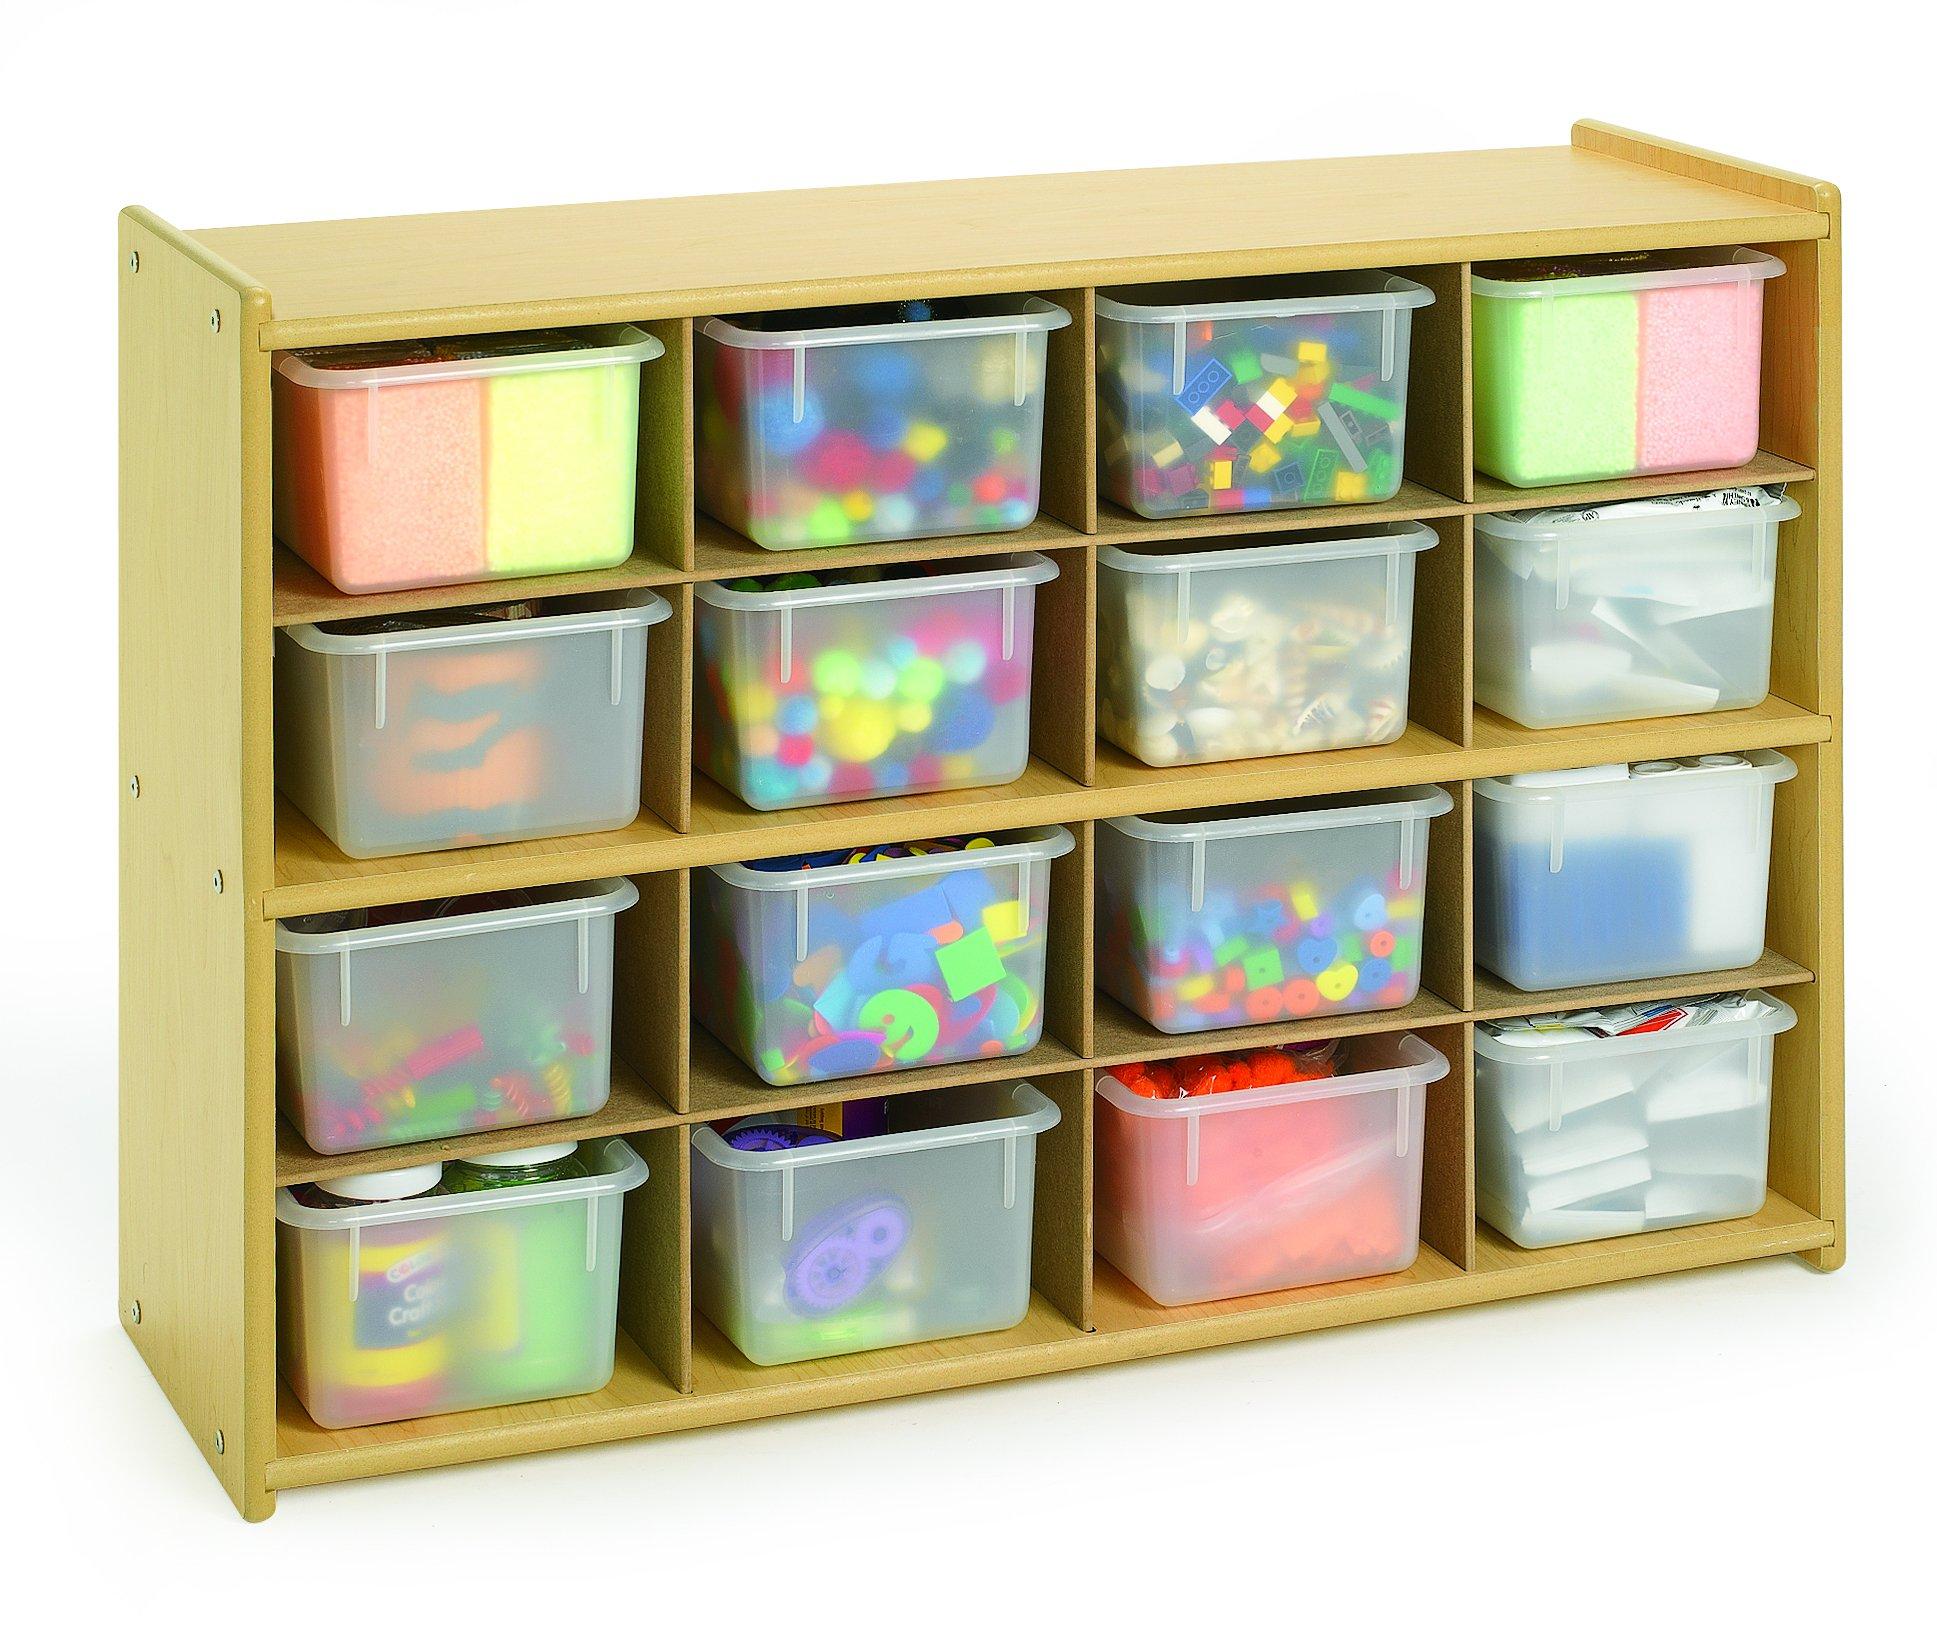 16 Tray Storage with Opaque Trays